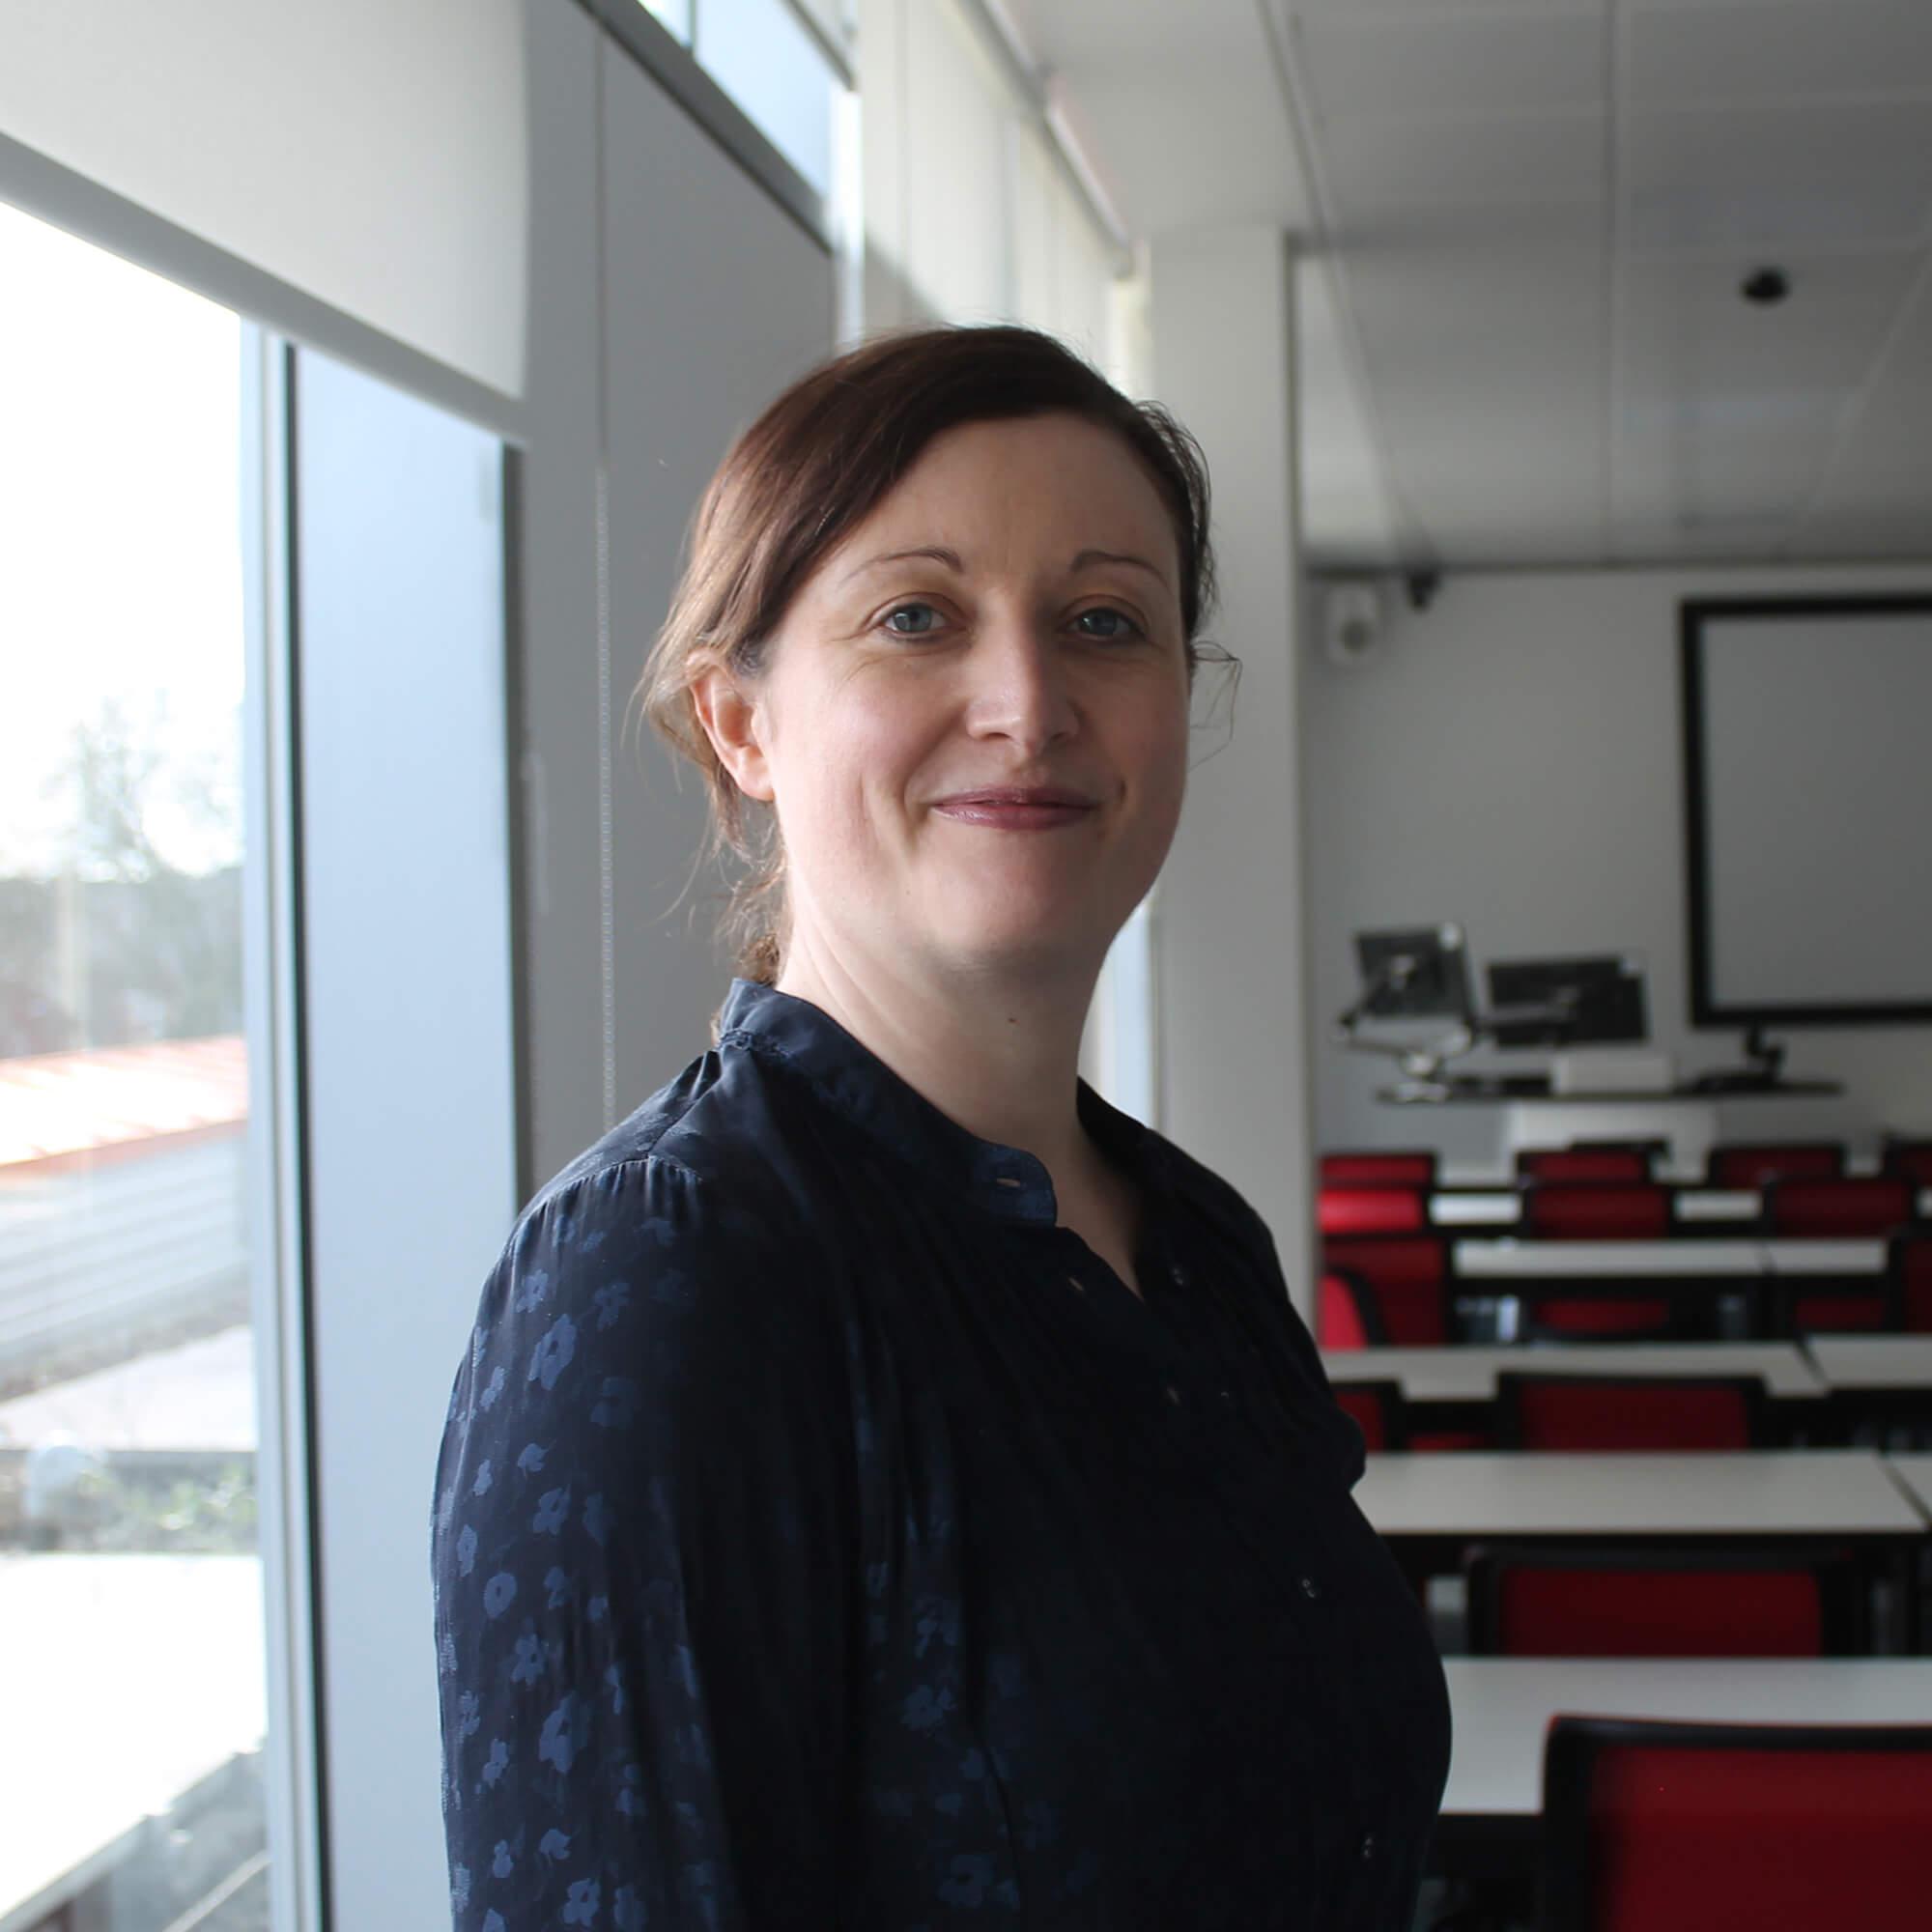 Rachel wearing a blue shirt, standing in a classroom, smiling